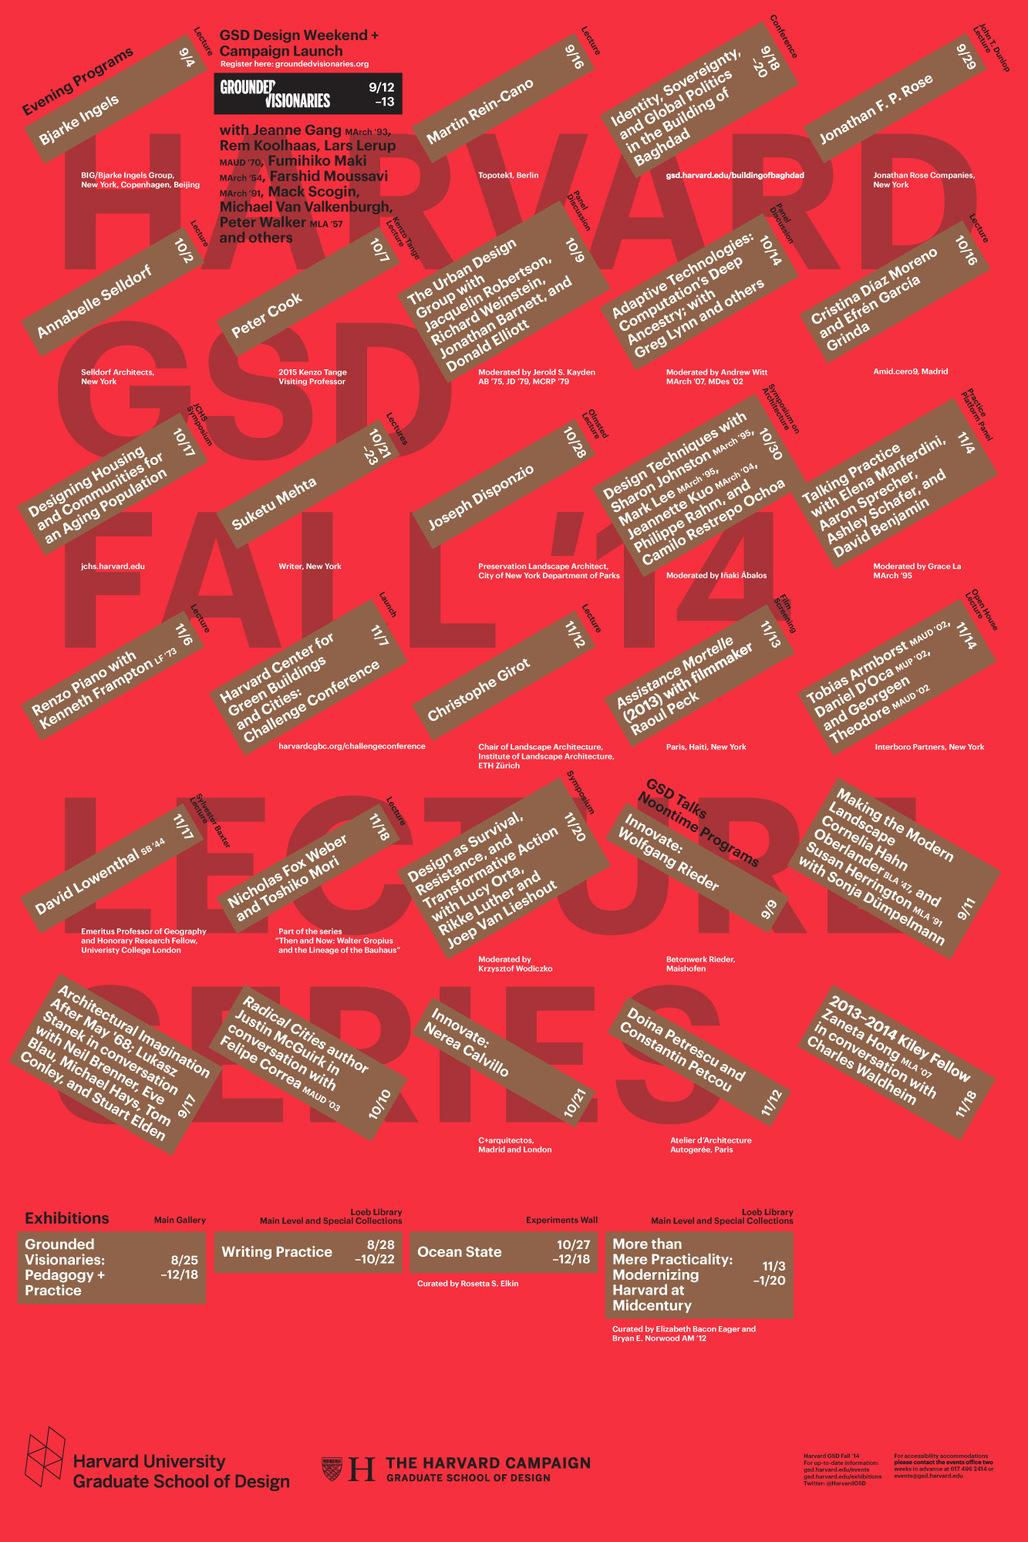 Harvard Graduate School of Design Fall 2014 lecture events. Poster designed by Bruce Mau Design. Image via gsd.harvard.edu.